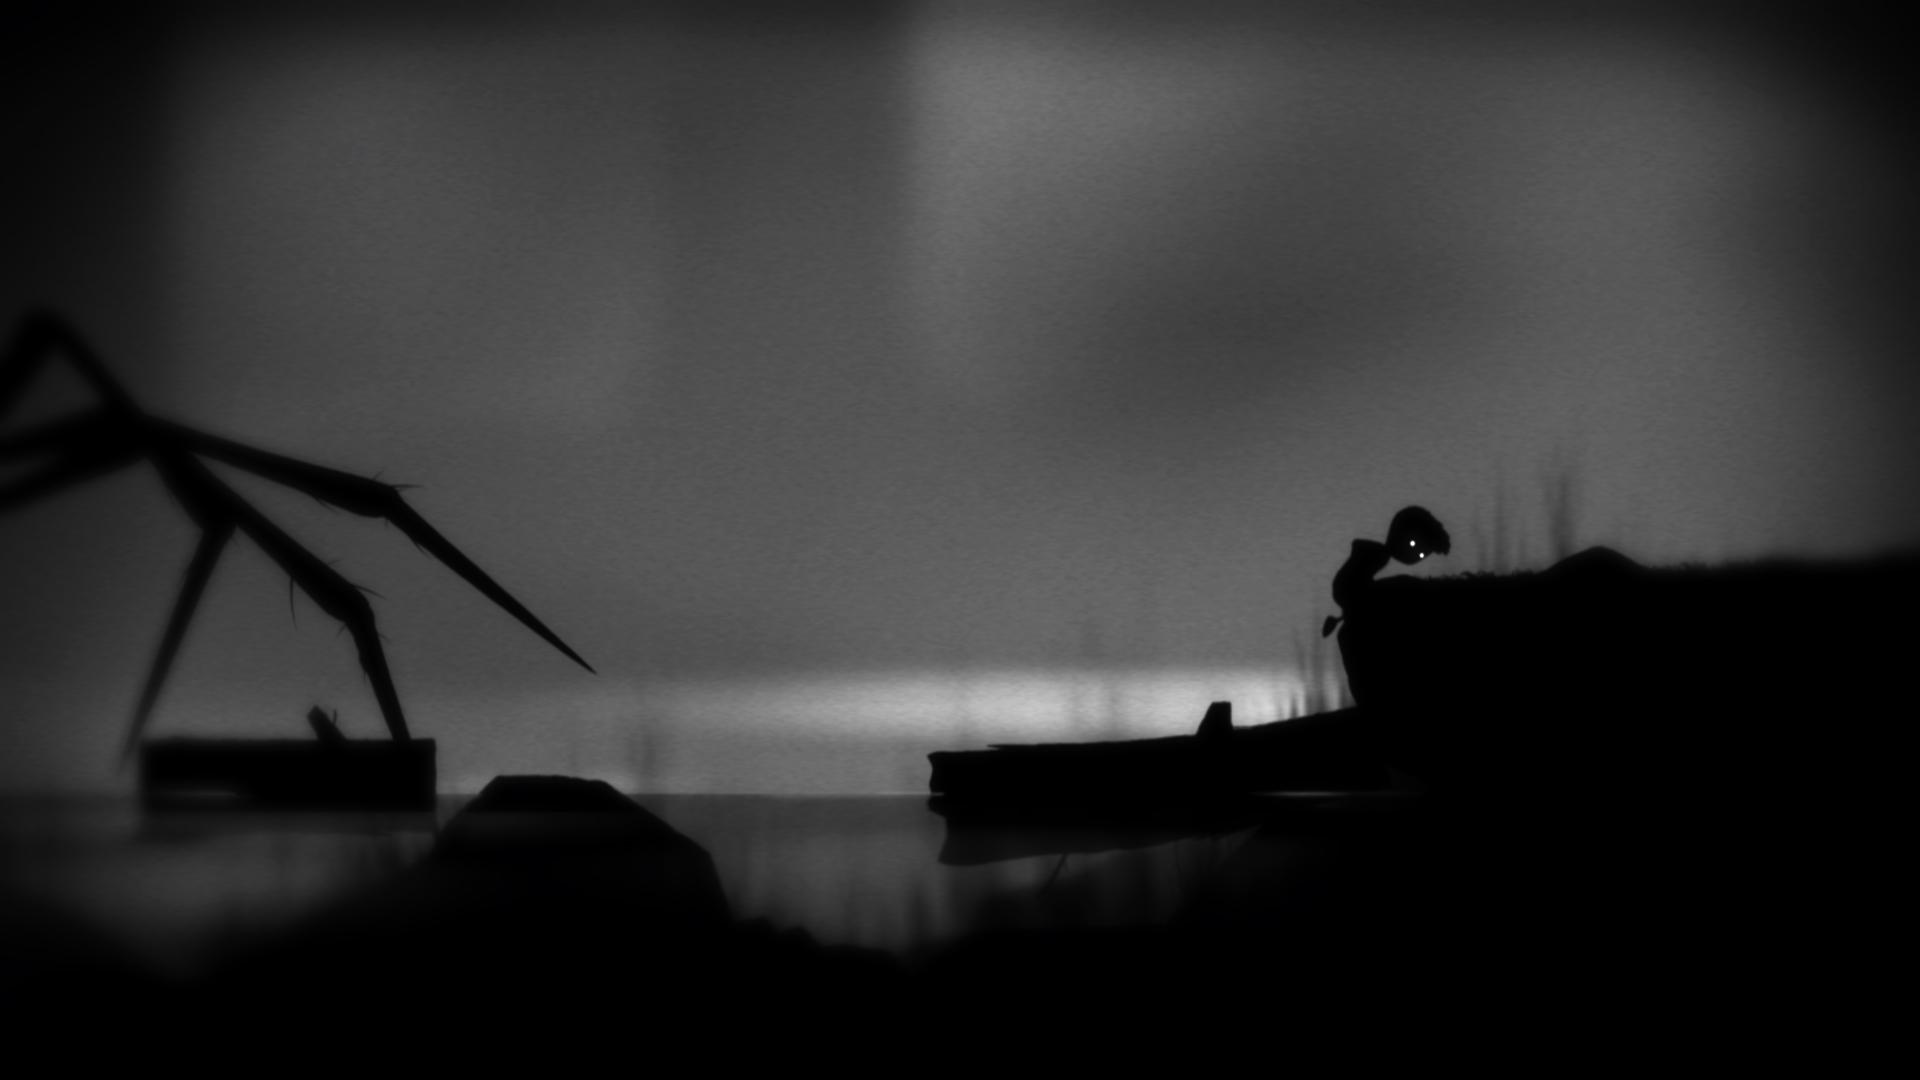 Limbo Free Download